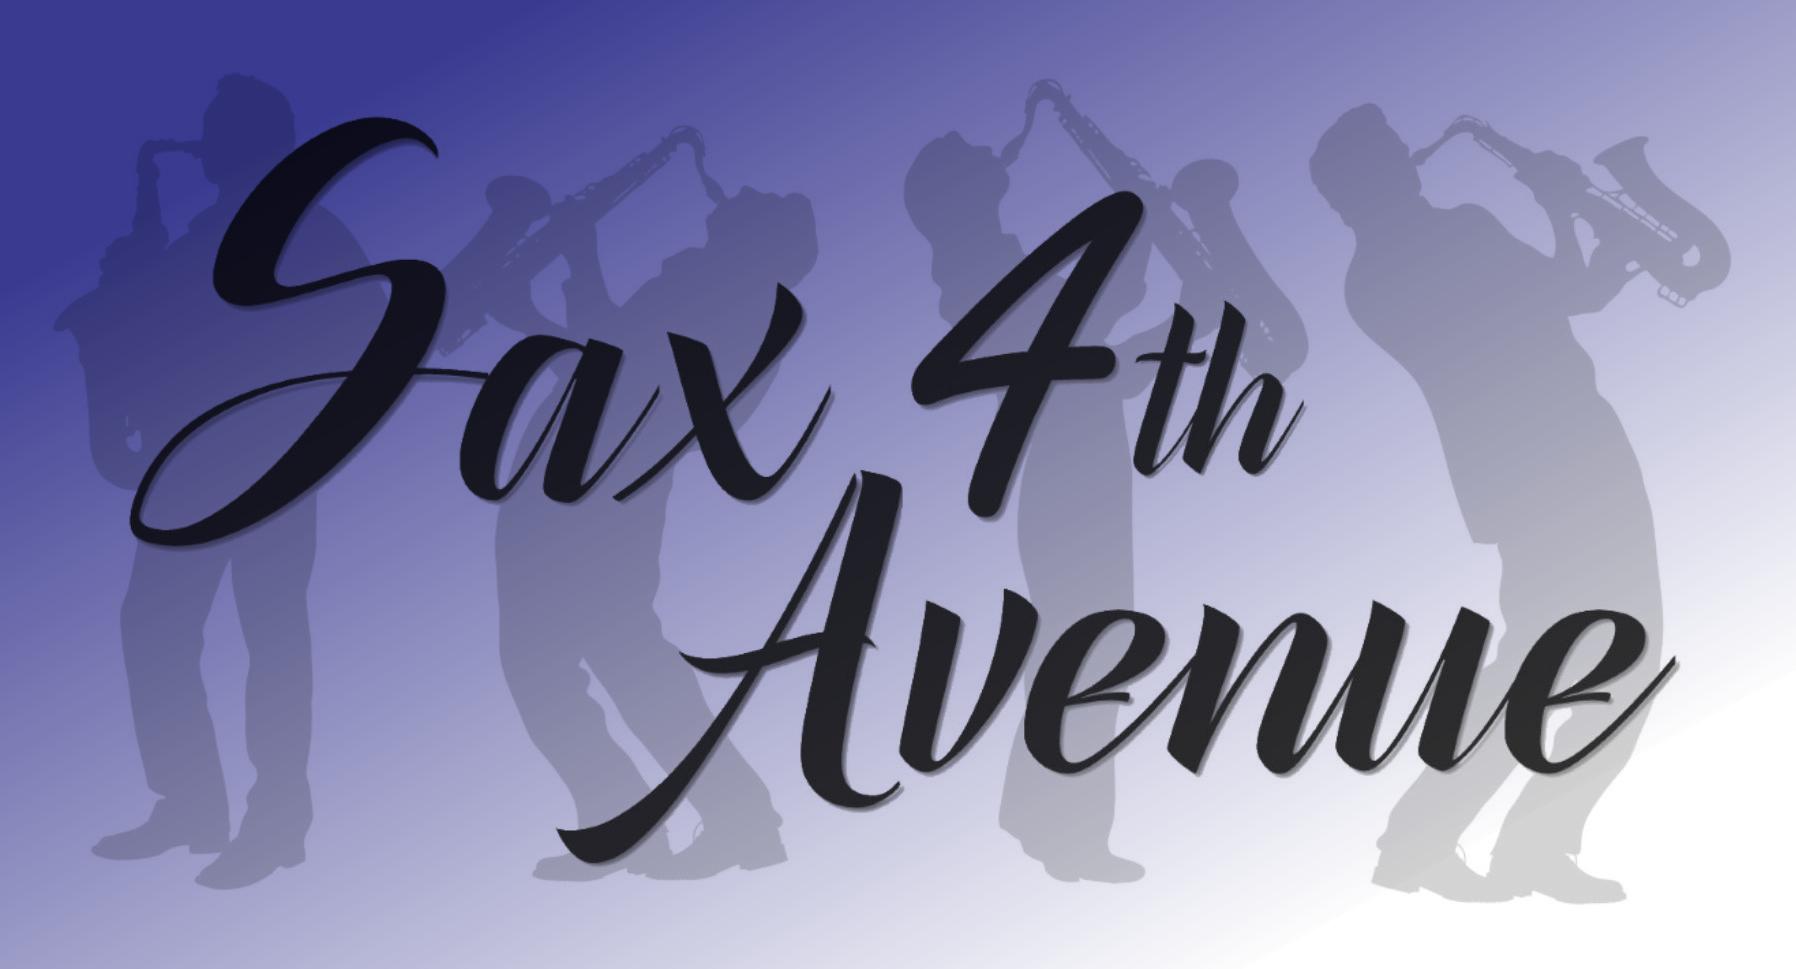 Sax 4th Avenue – Περιοδεία στην Ελλάδα